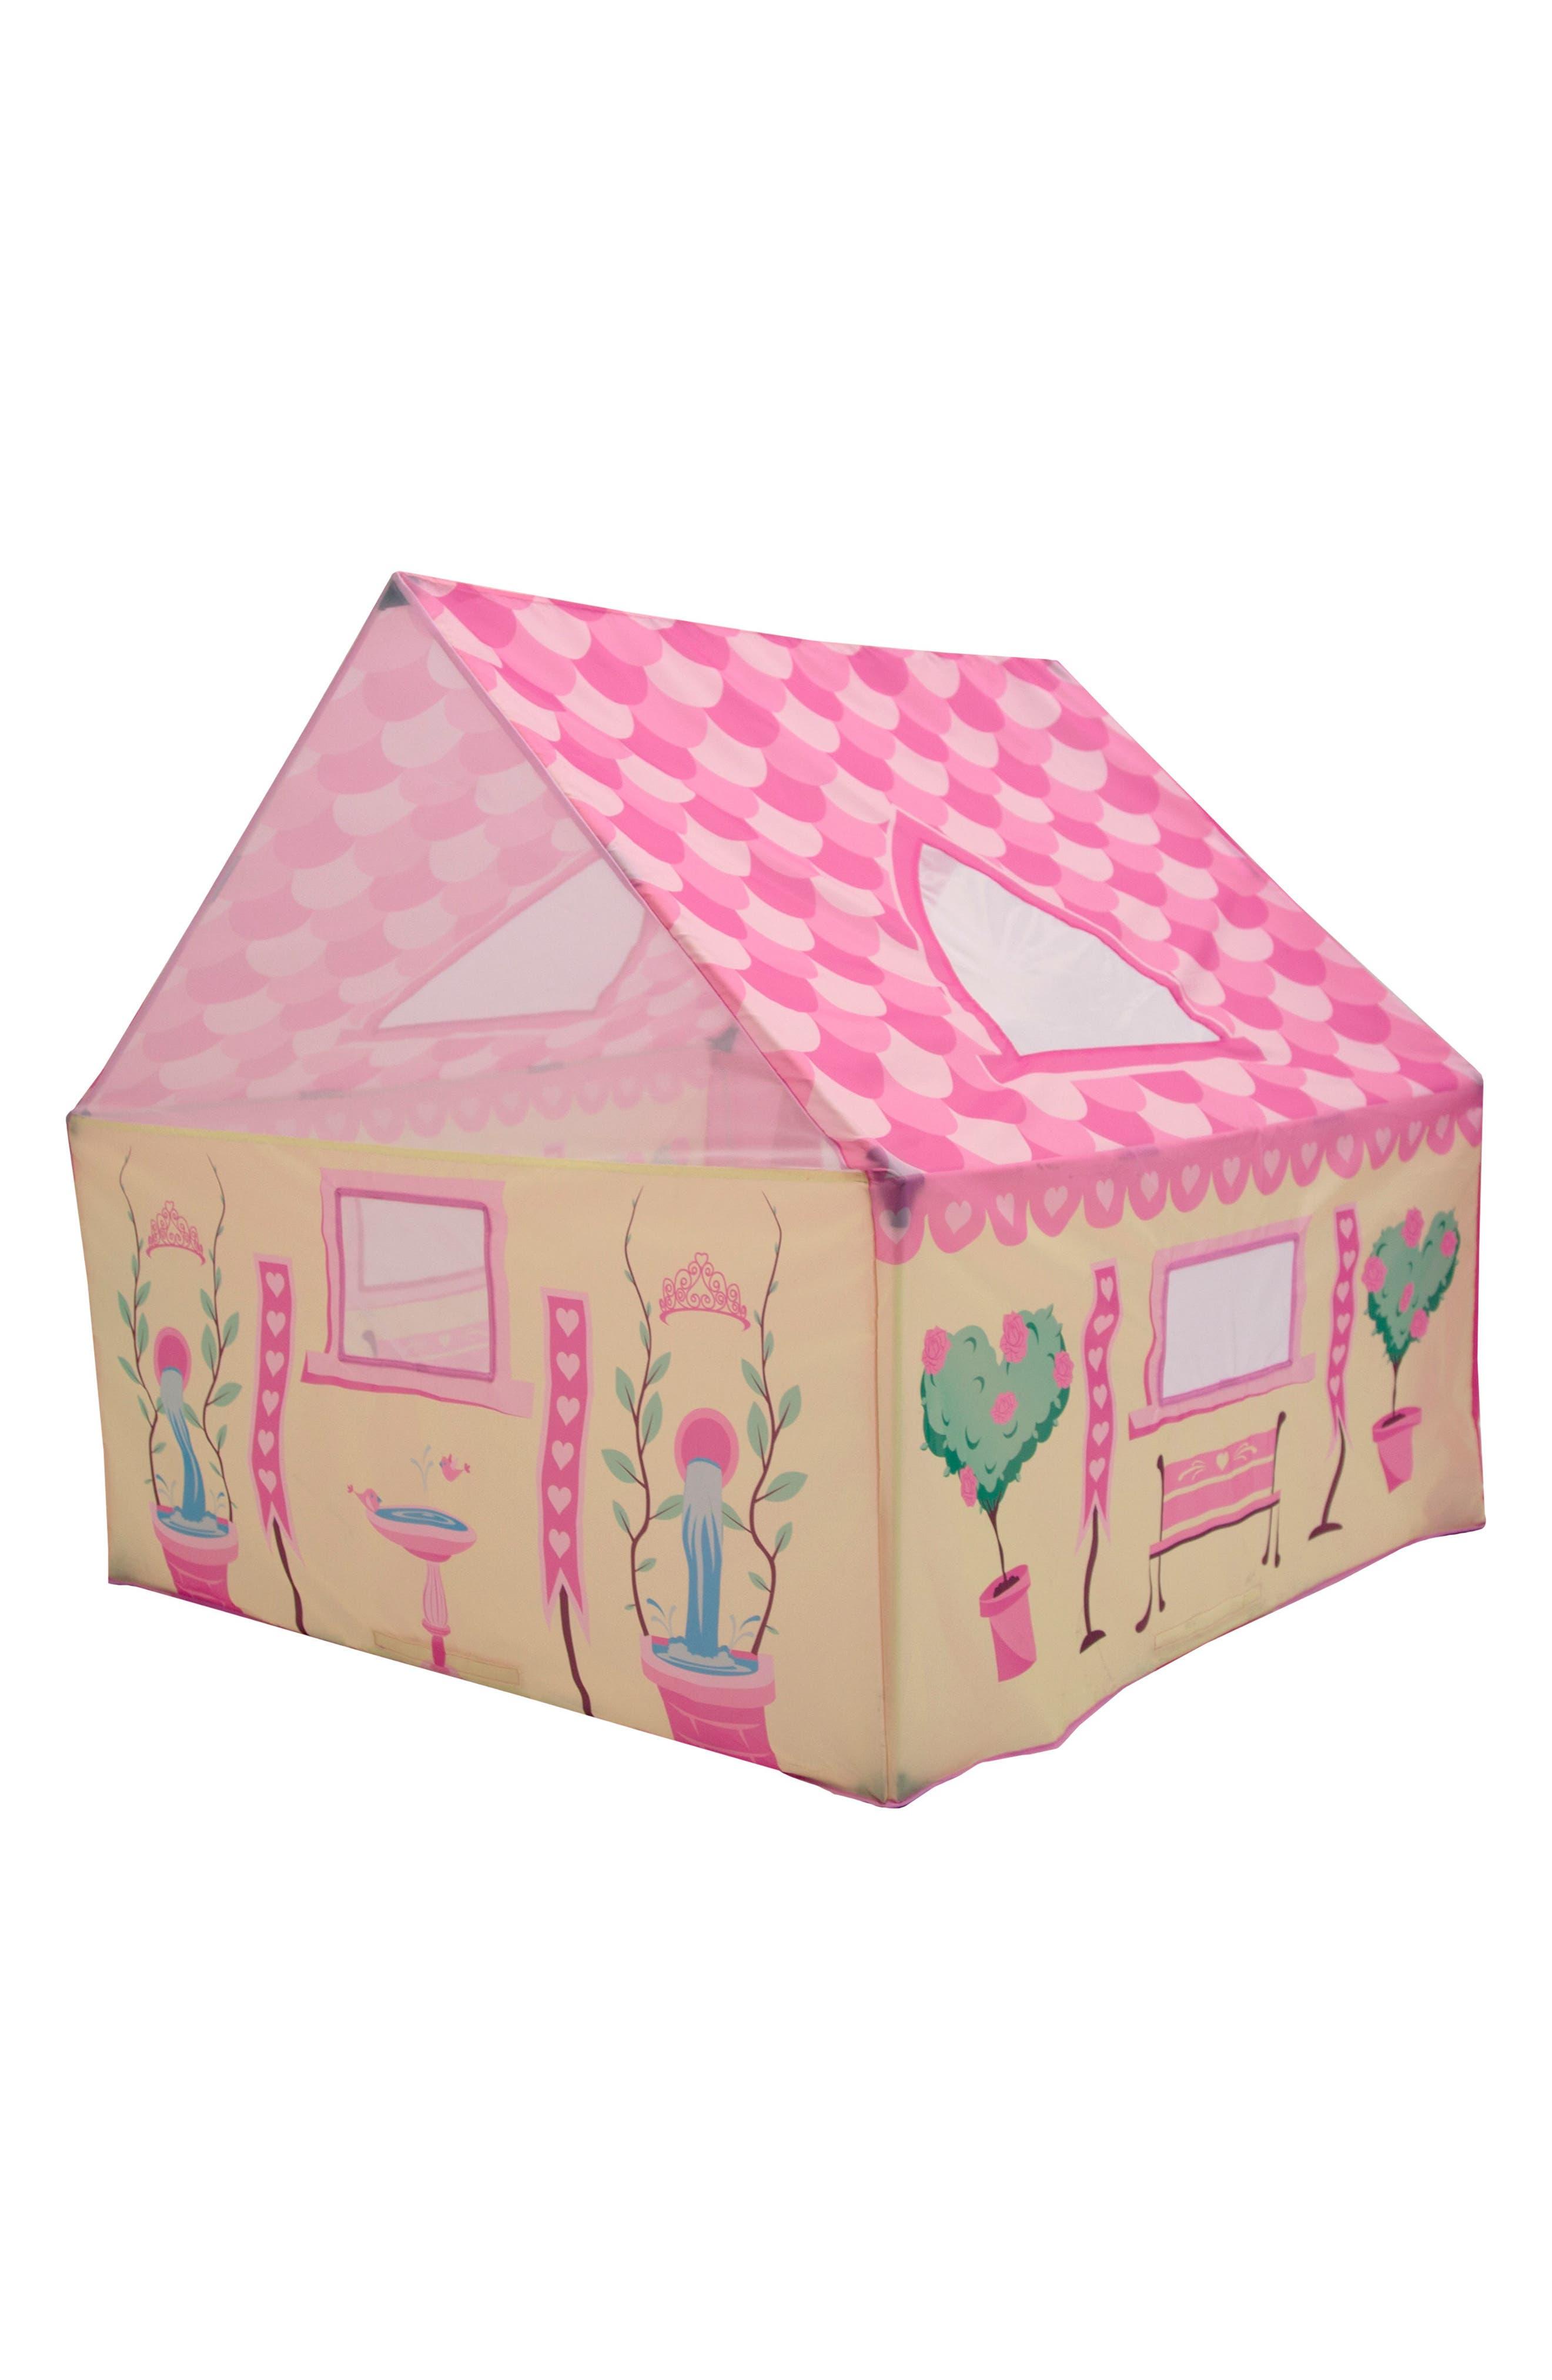 Tea Party Garden Playhouse Tent,                             Main thumbnail 1, color,                             PINK